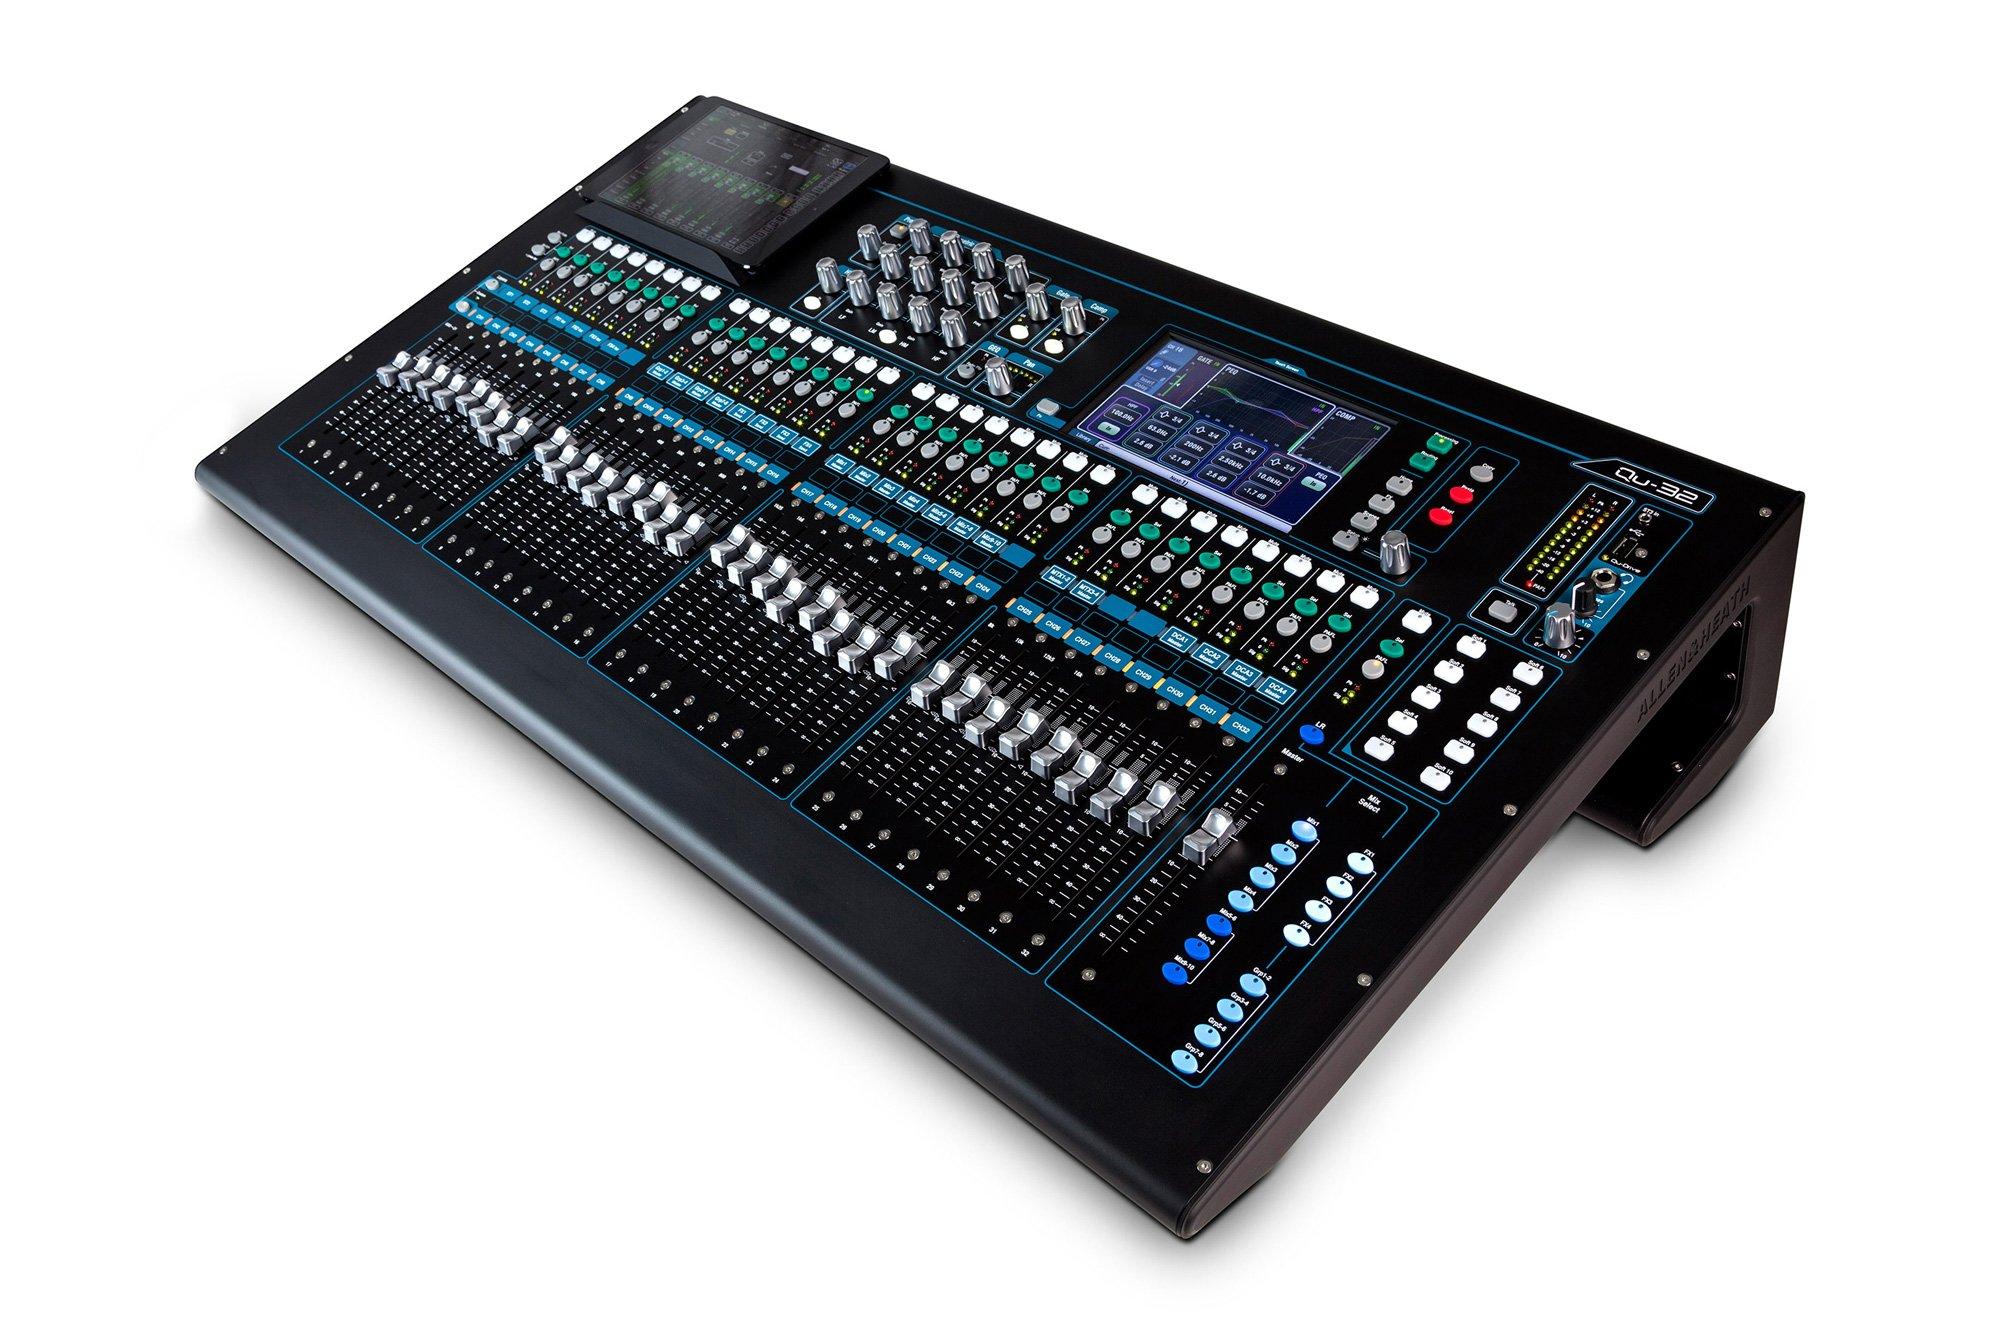 allen heath qu 32c 38 in 28 out digital audio mixer chrome edition. Black Bedroom Furniture Sets. Home Design Ideas